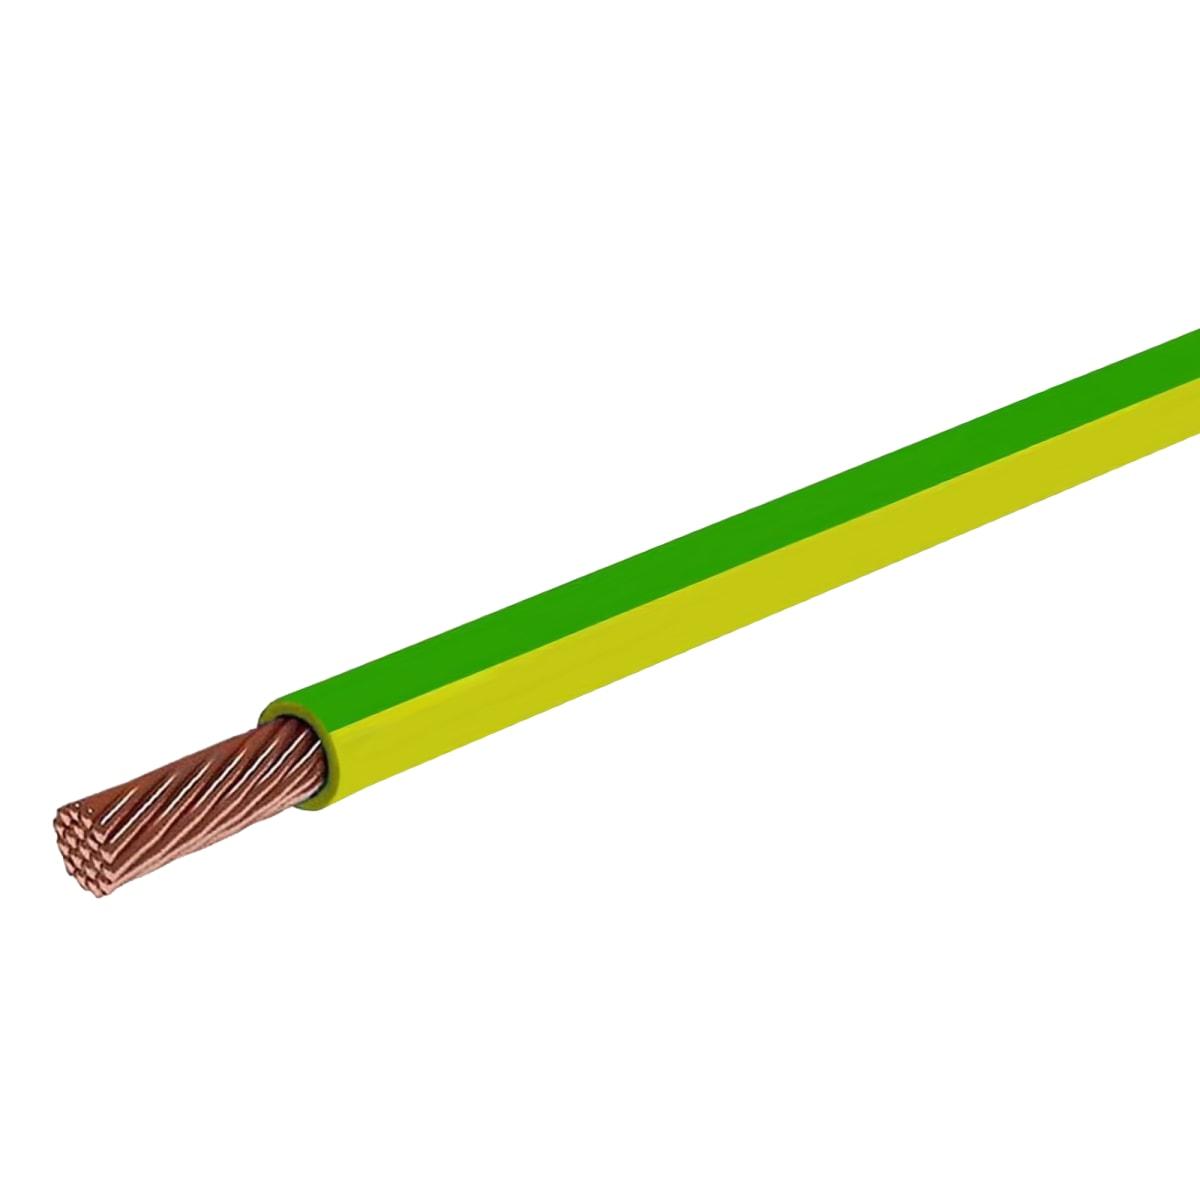 Провод Electraline ПуГВ 1x2.5, на отрез, цвет желто-зеленый